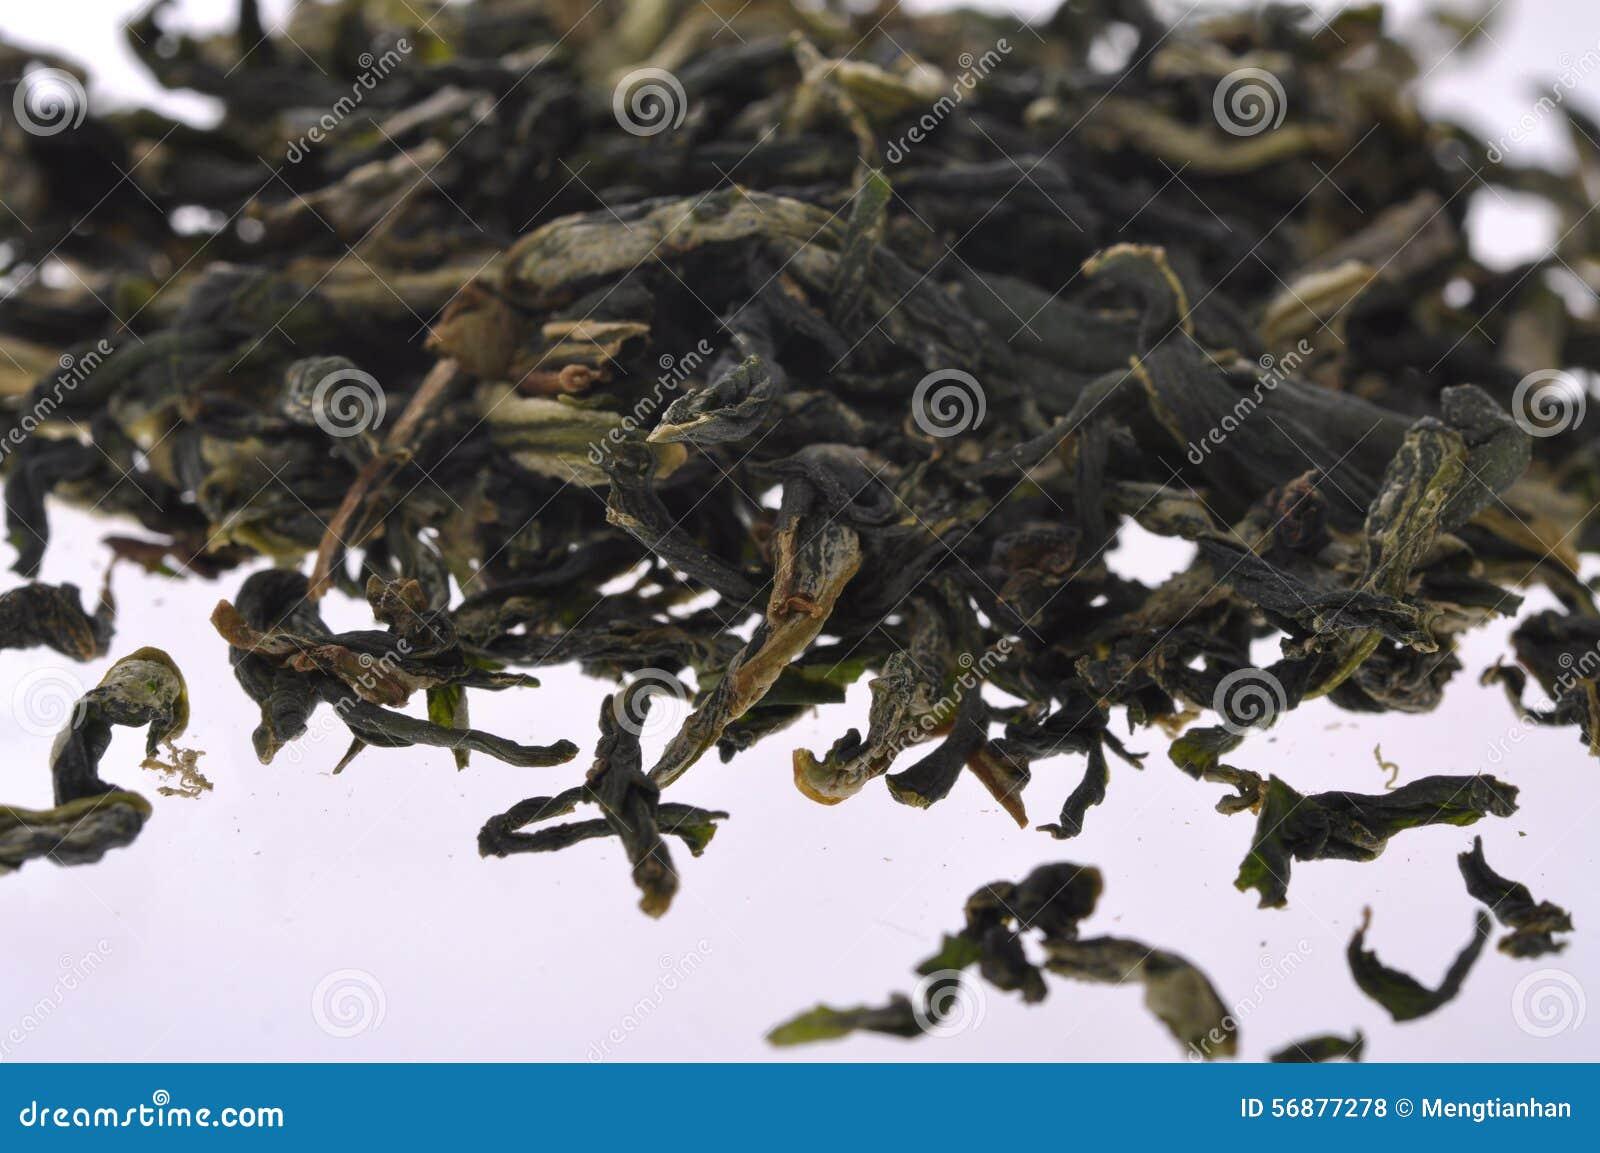 Tè scuro--tè fermentato popolare in Cina